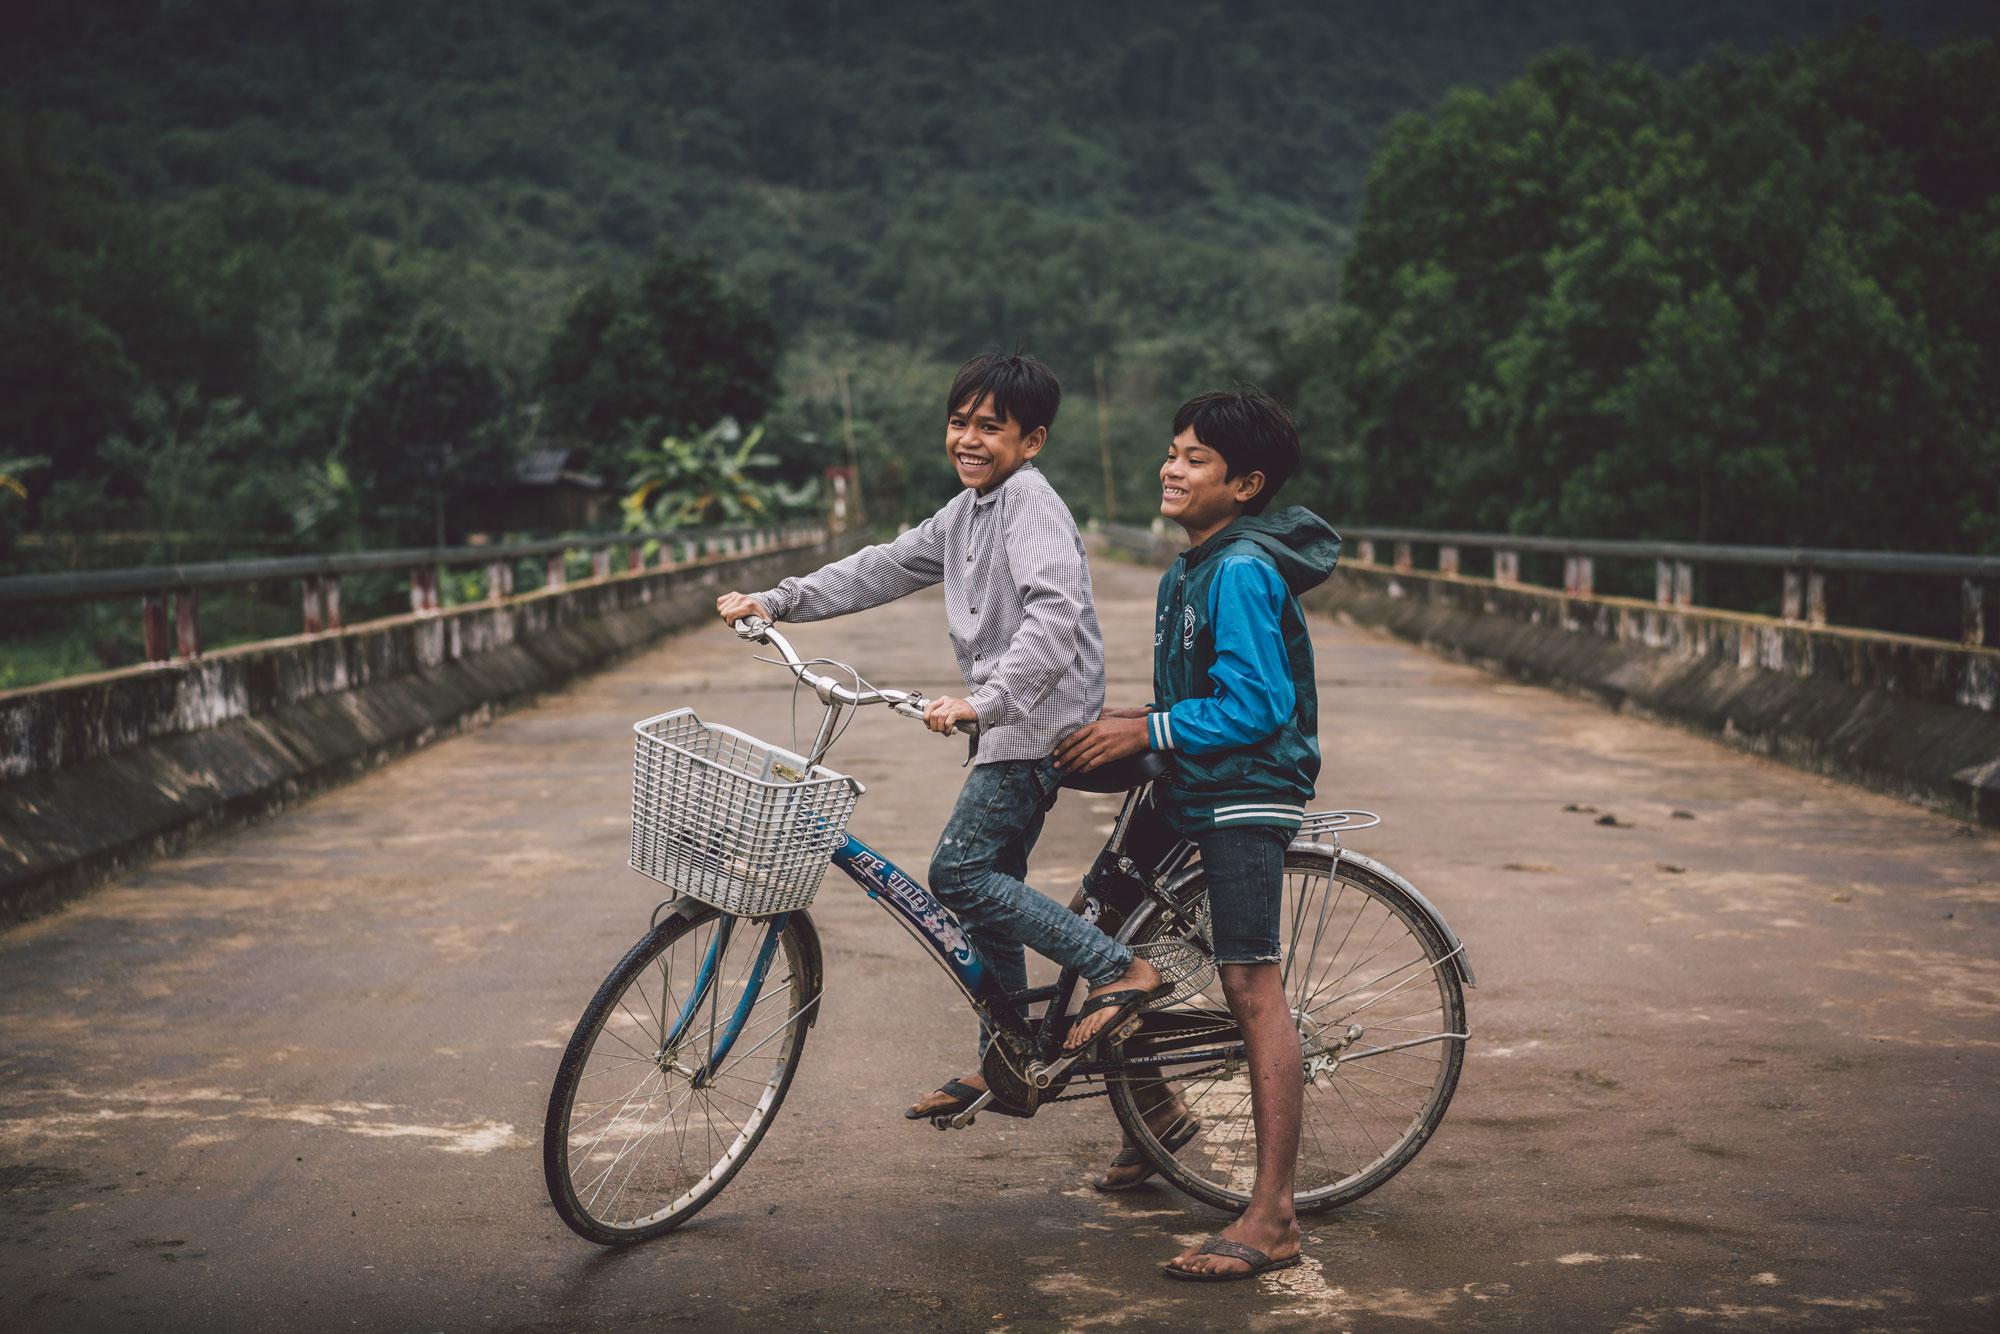 ©RomanKoenigshofer_Vietnam_Local Boys_Kids_Bicycle_Ho_Chi_Minh_Trail_DSC06612